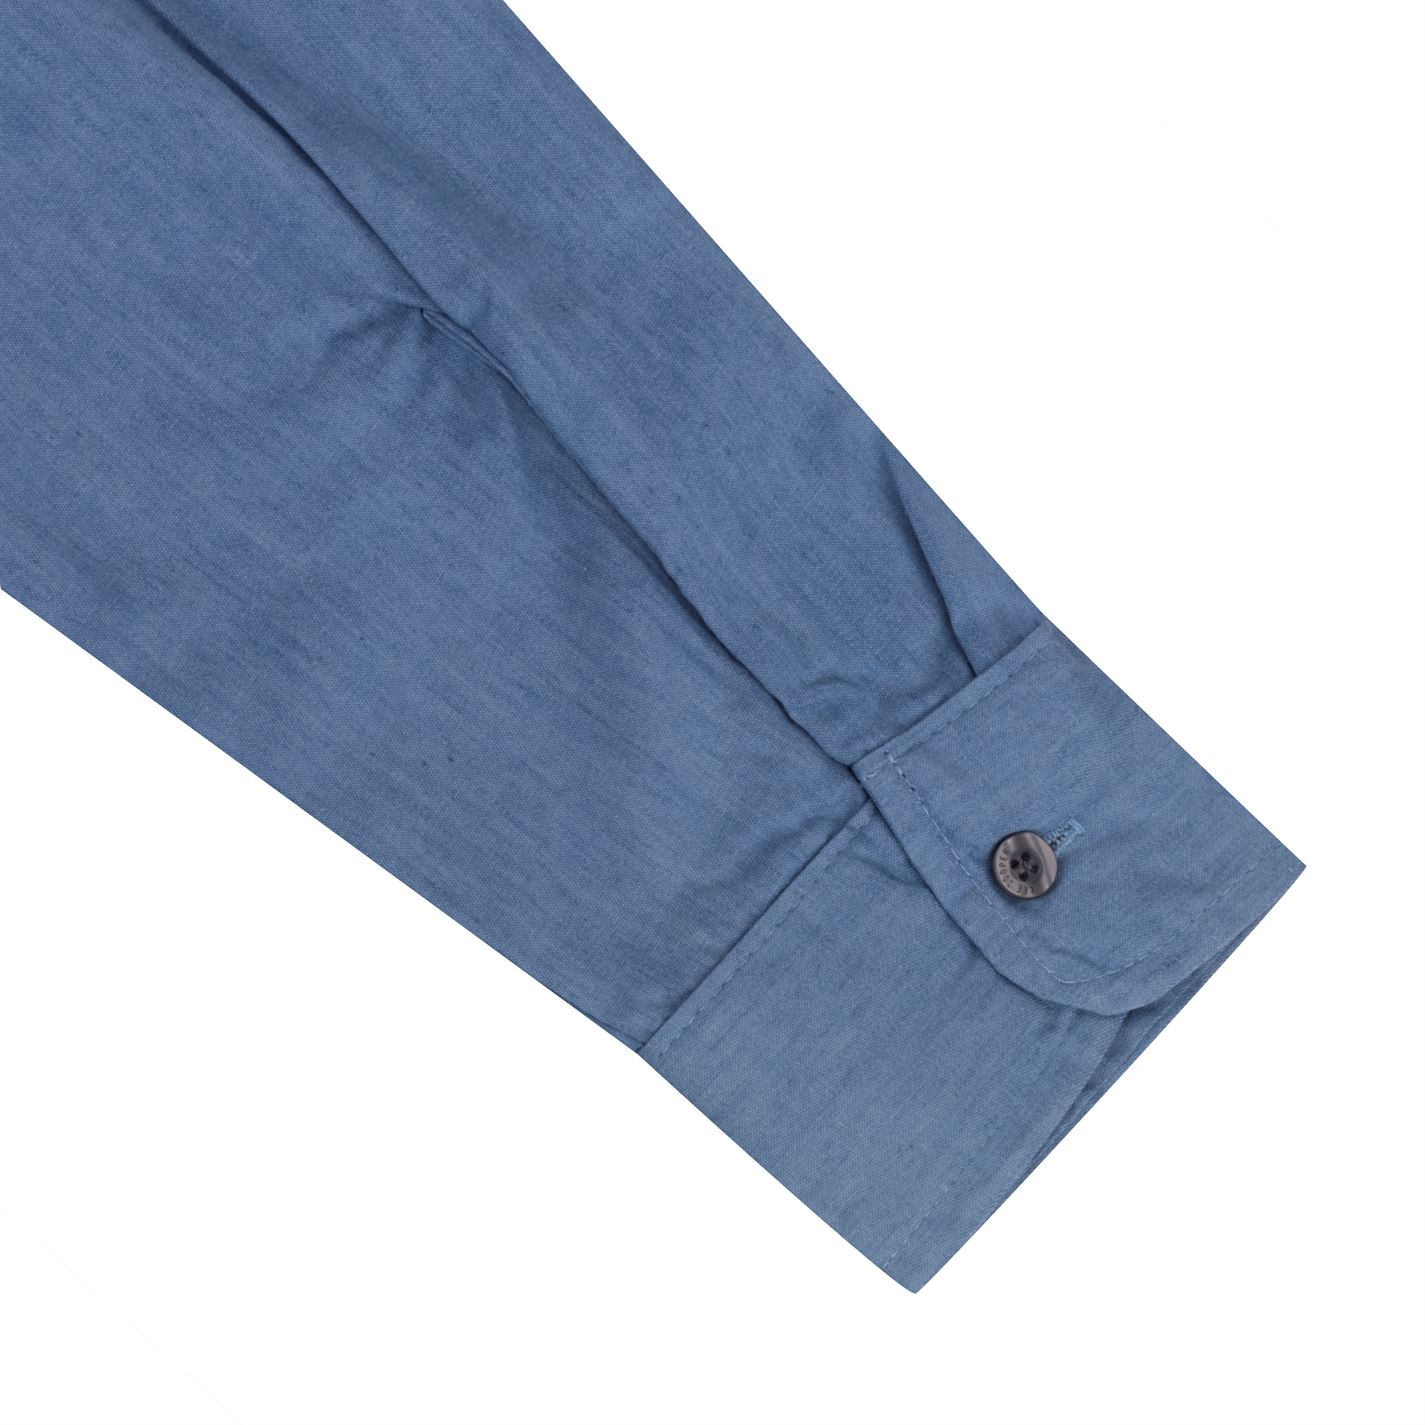 Lee Cooper Mens Casual Denim Shirt Long Sleeve Cotton Chest Pocket